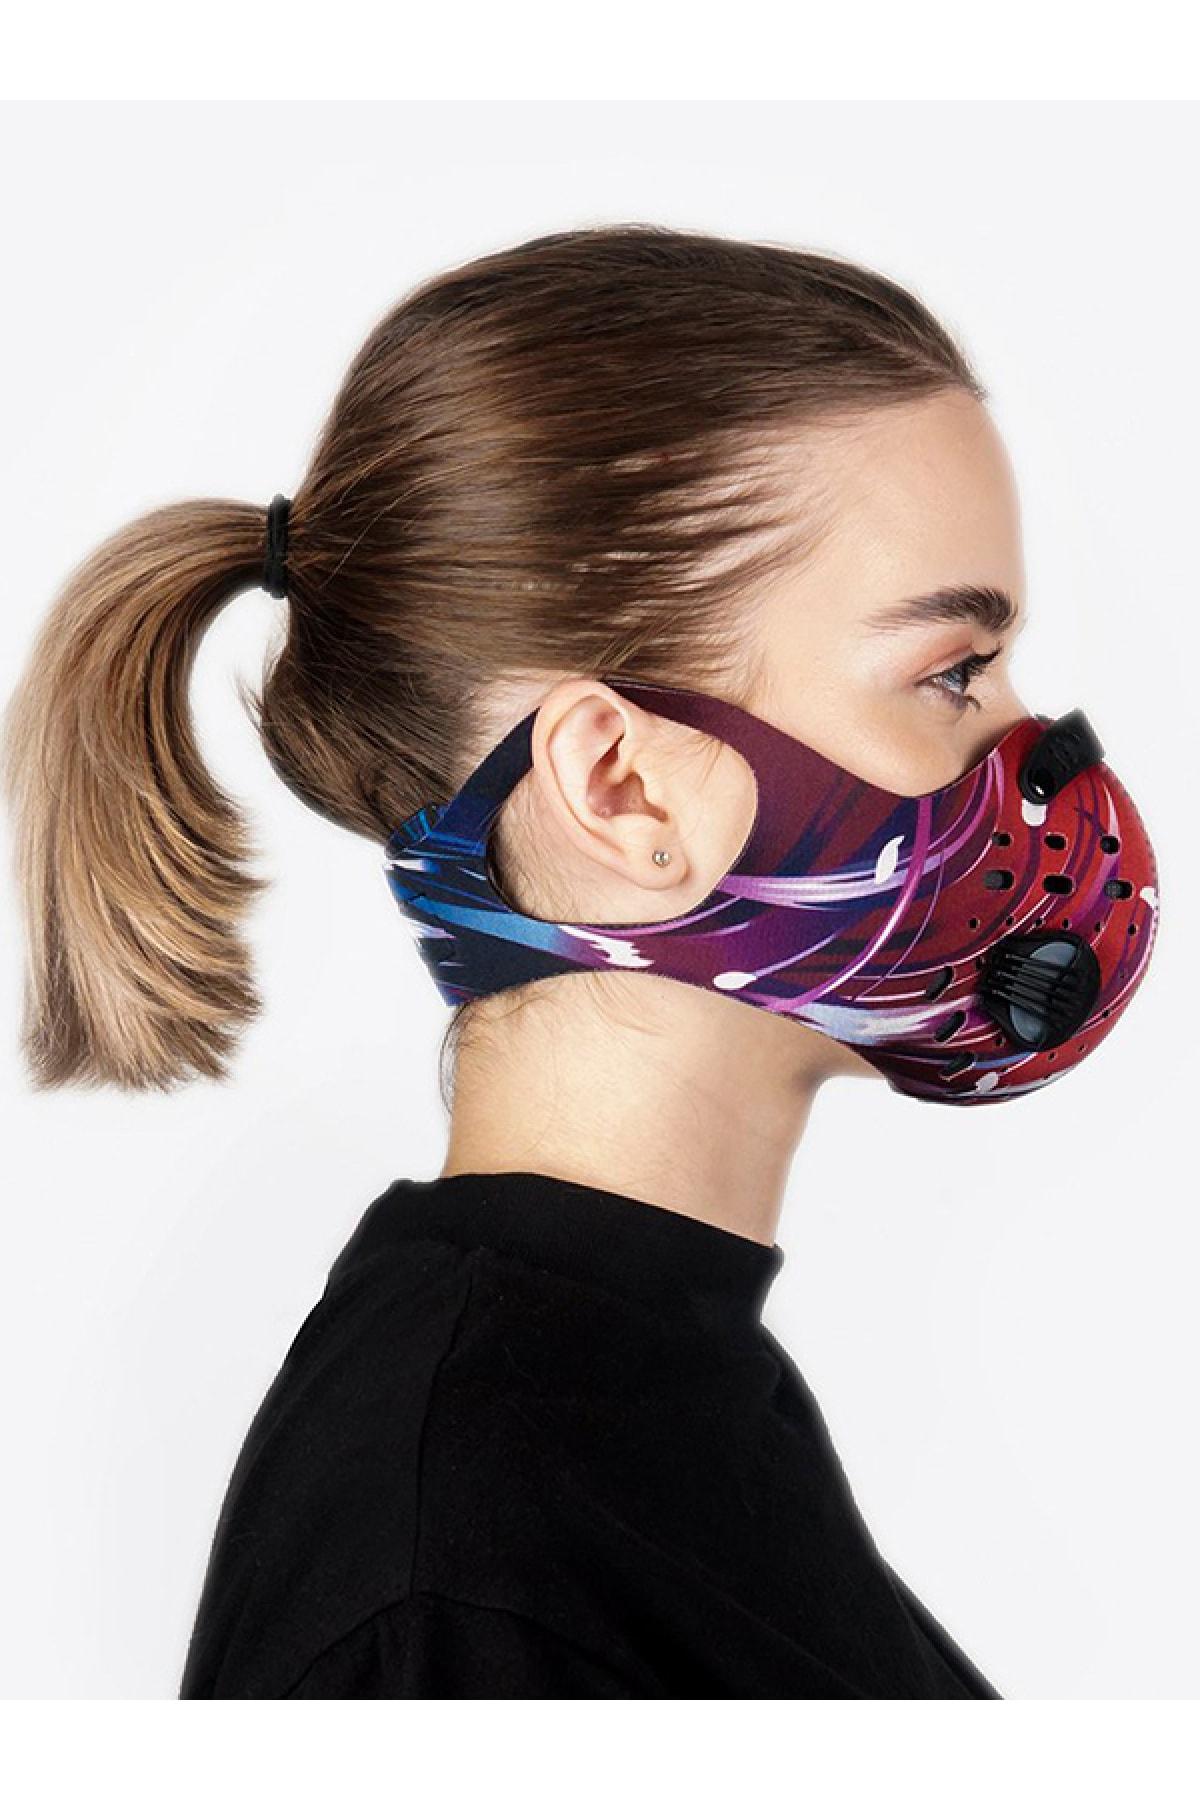 CHUM Kadın Lightspeed Aktif Karbon Filtreli Outdoor Maske 1